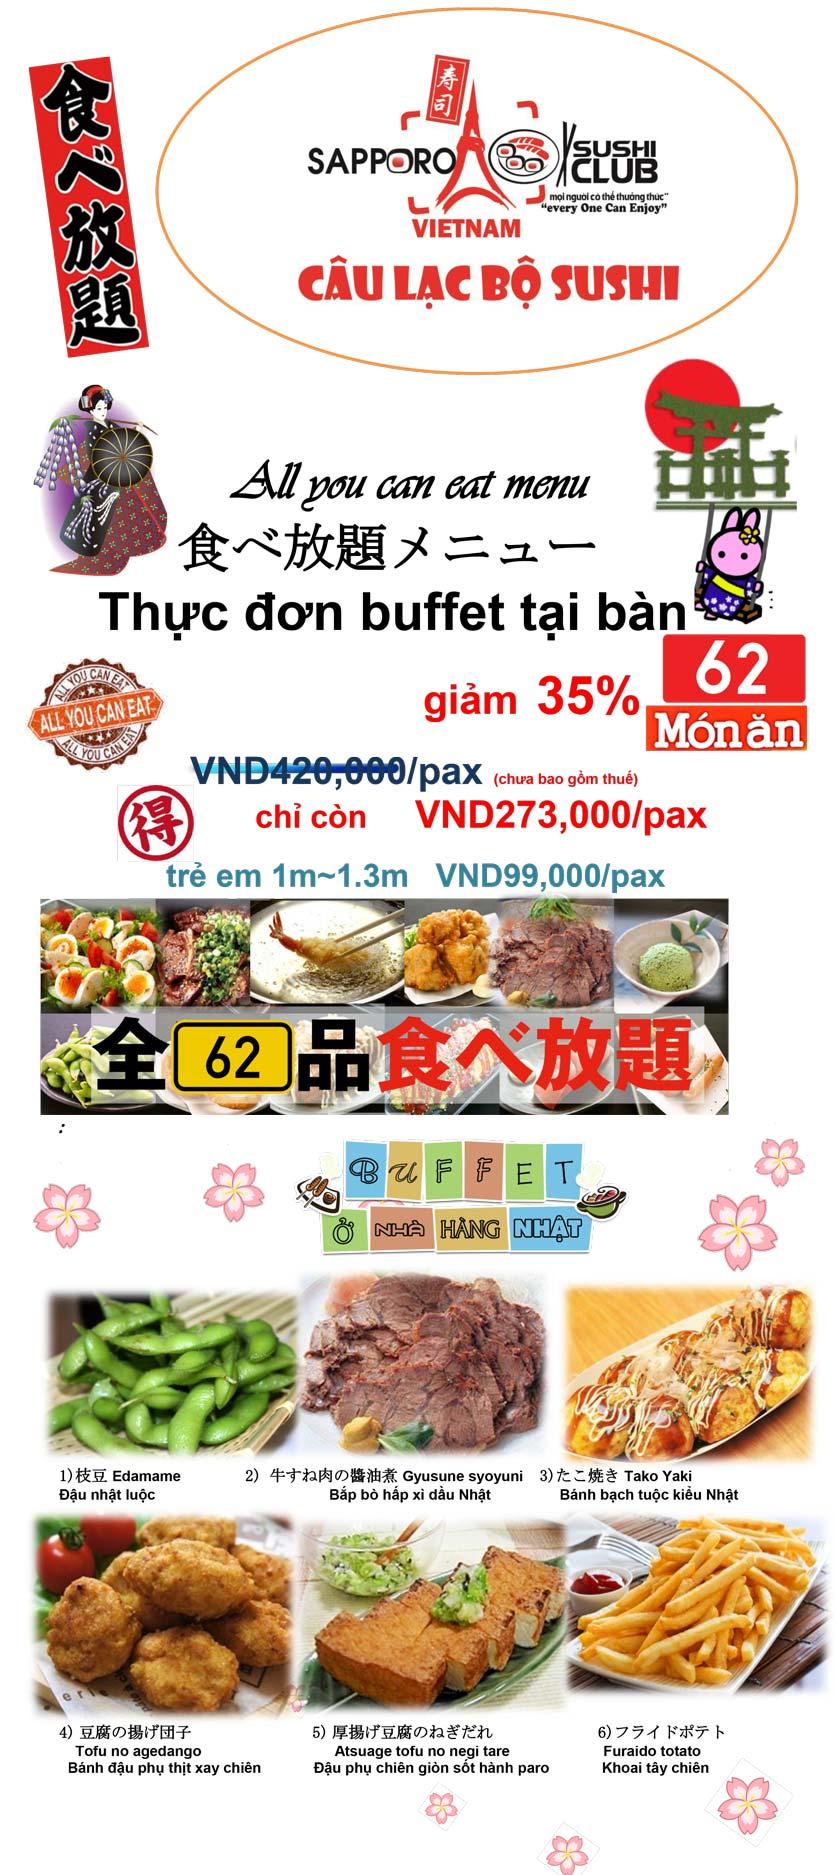 Menu Doki Doki Sushi Club - Nguyễn Hoàng 1